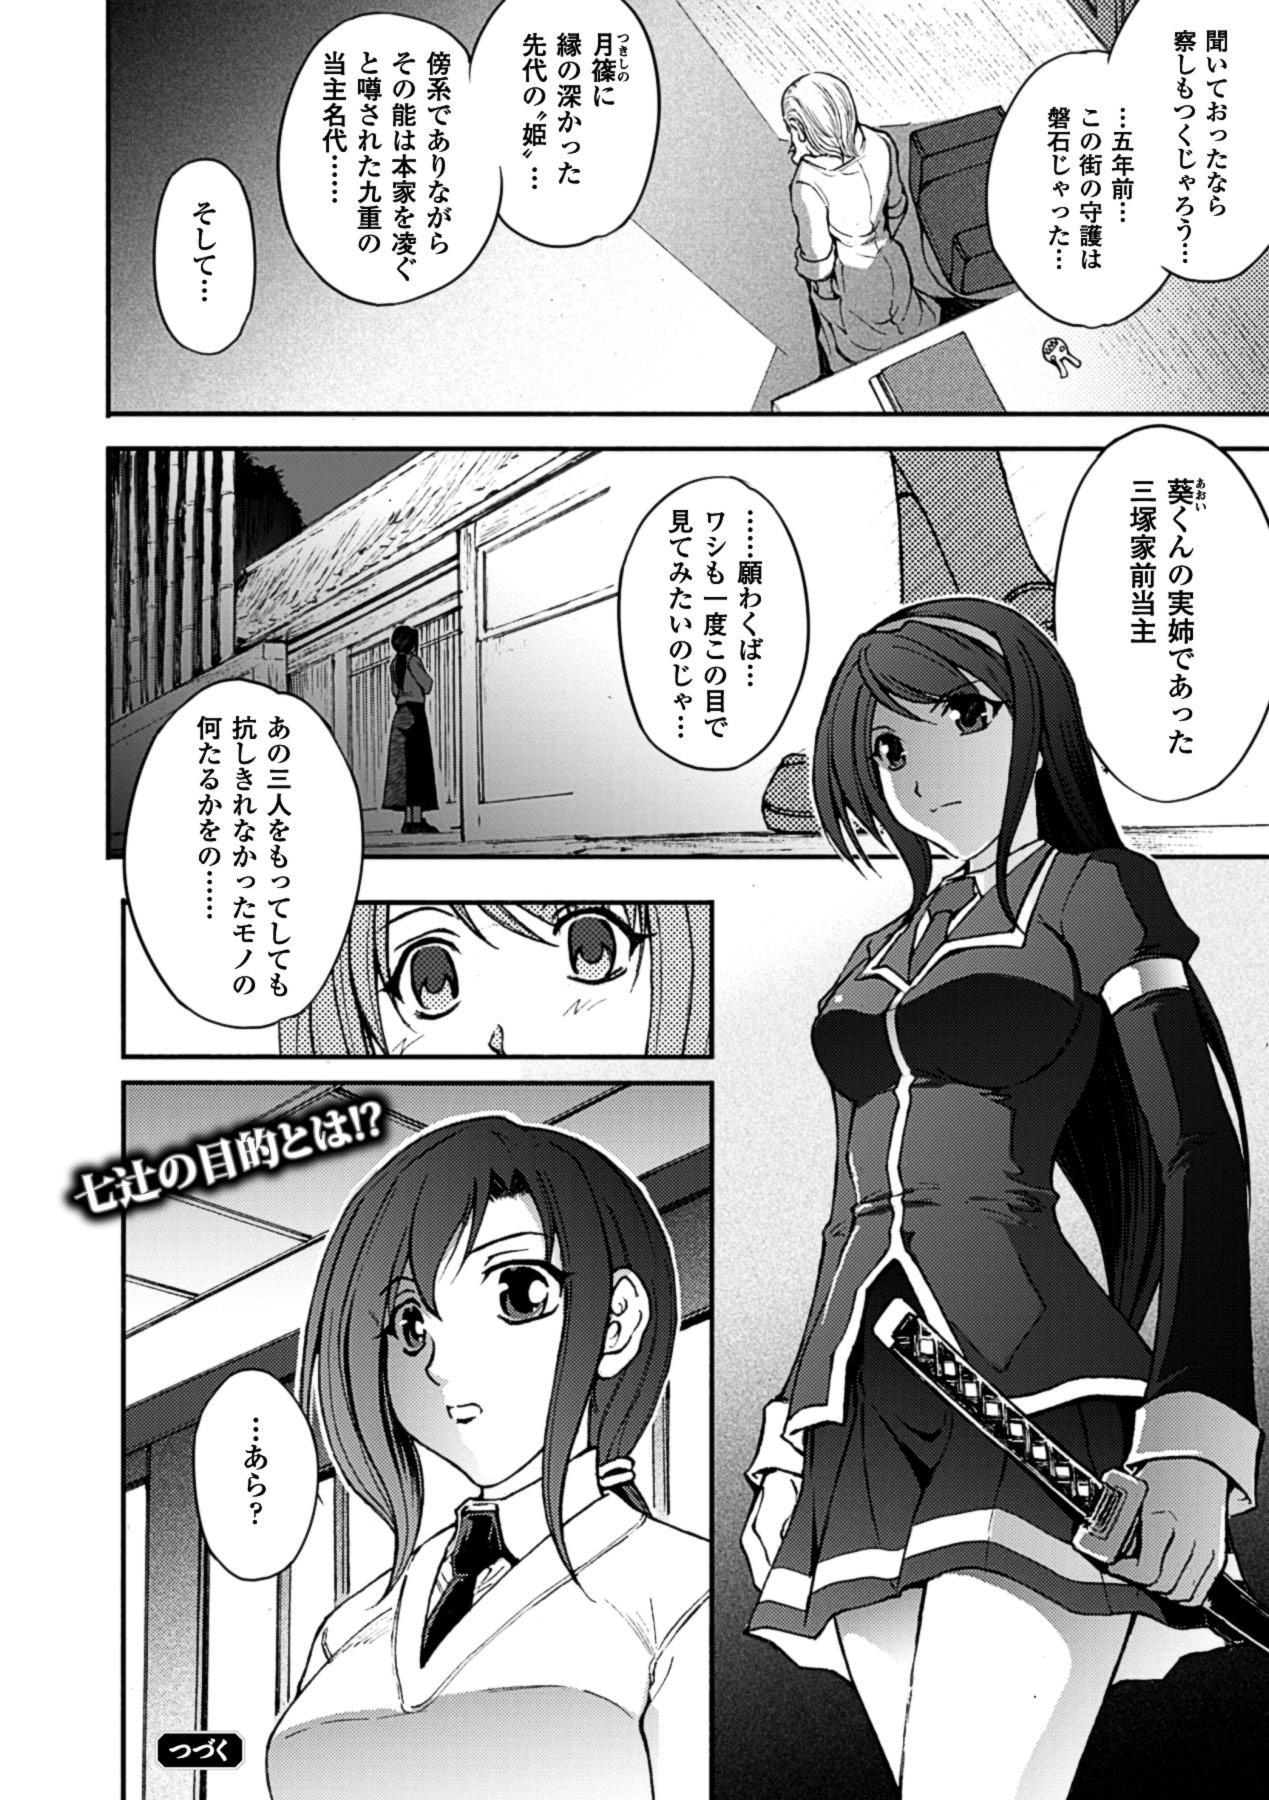 Megami Crisis 10 153